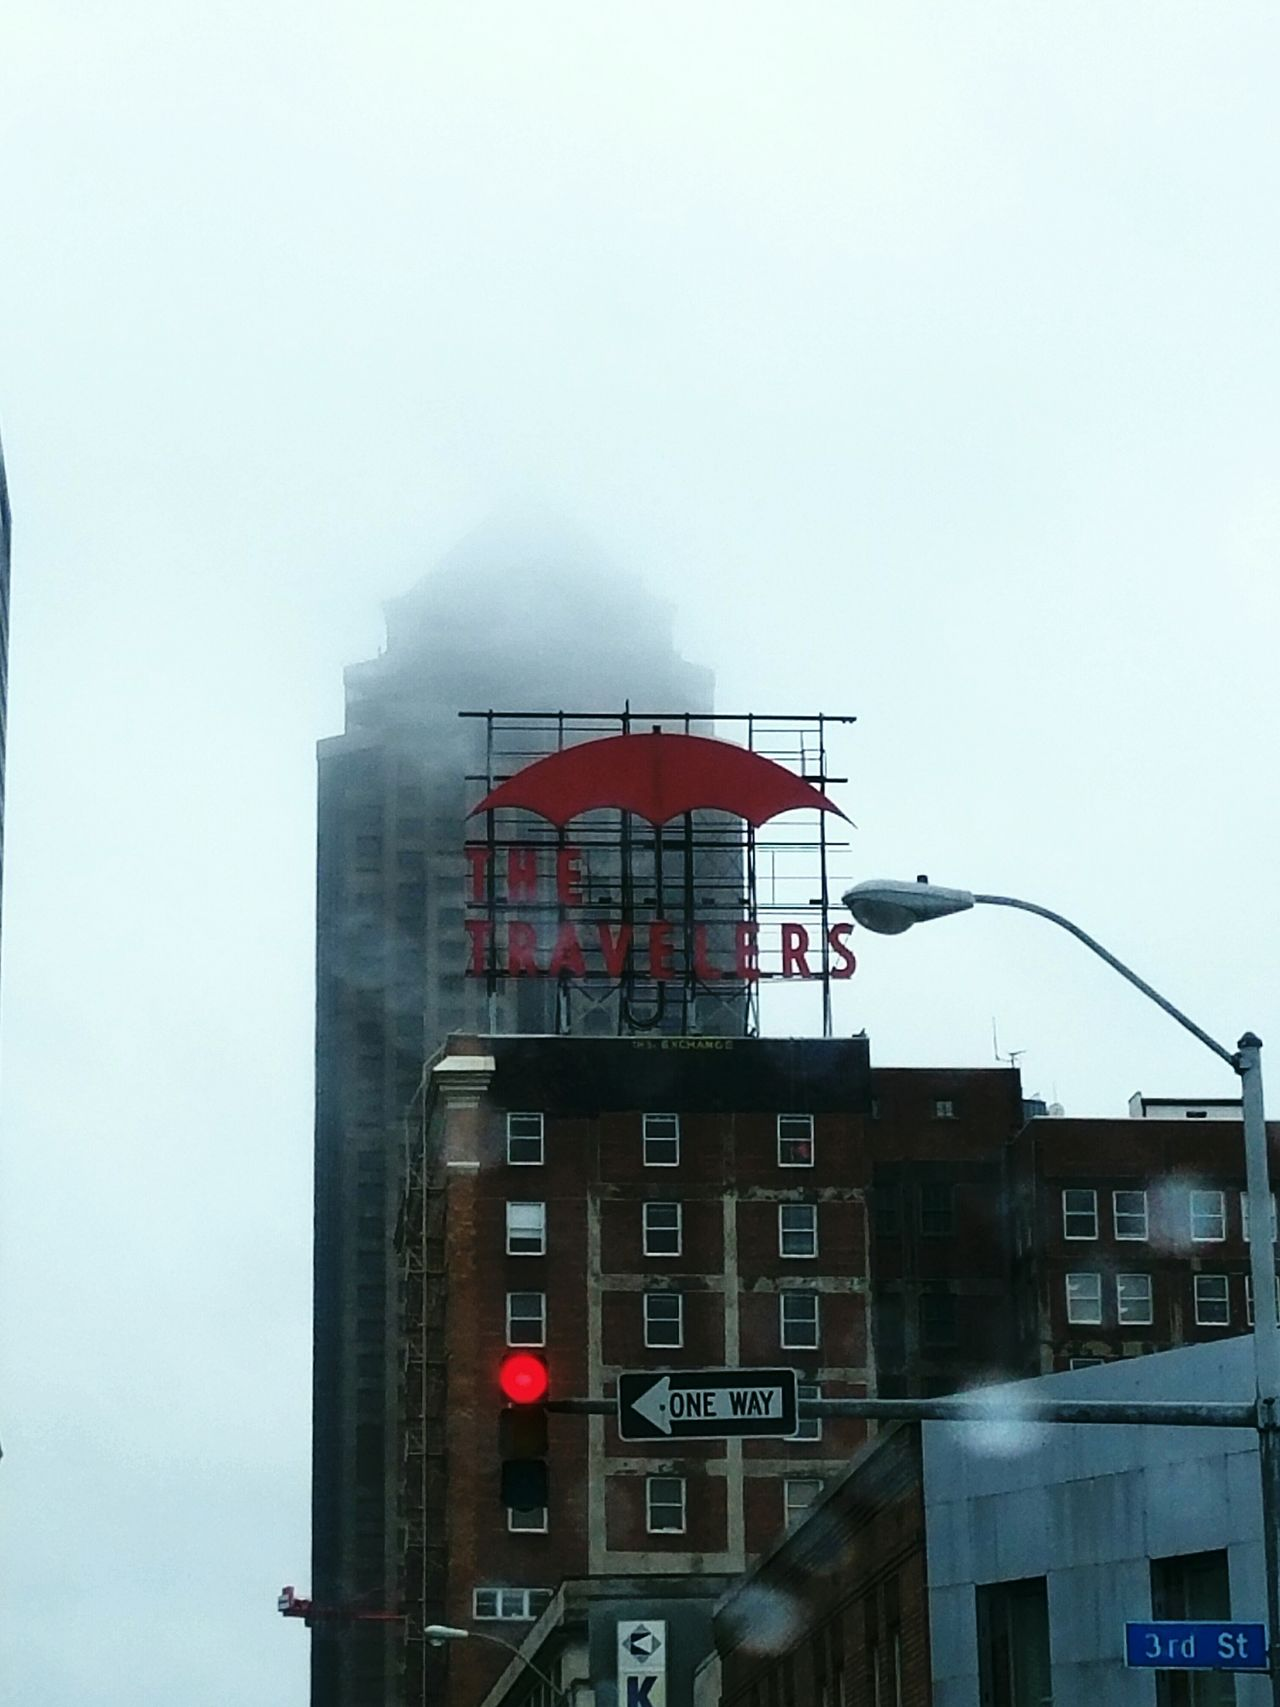 The Travelers Built Structure City Sky EyeEm RainDrop Weather EyeEm Best Shots Android Photography Rainy Days